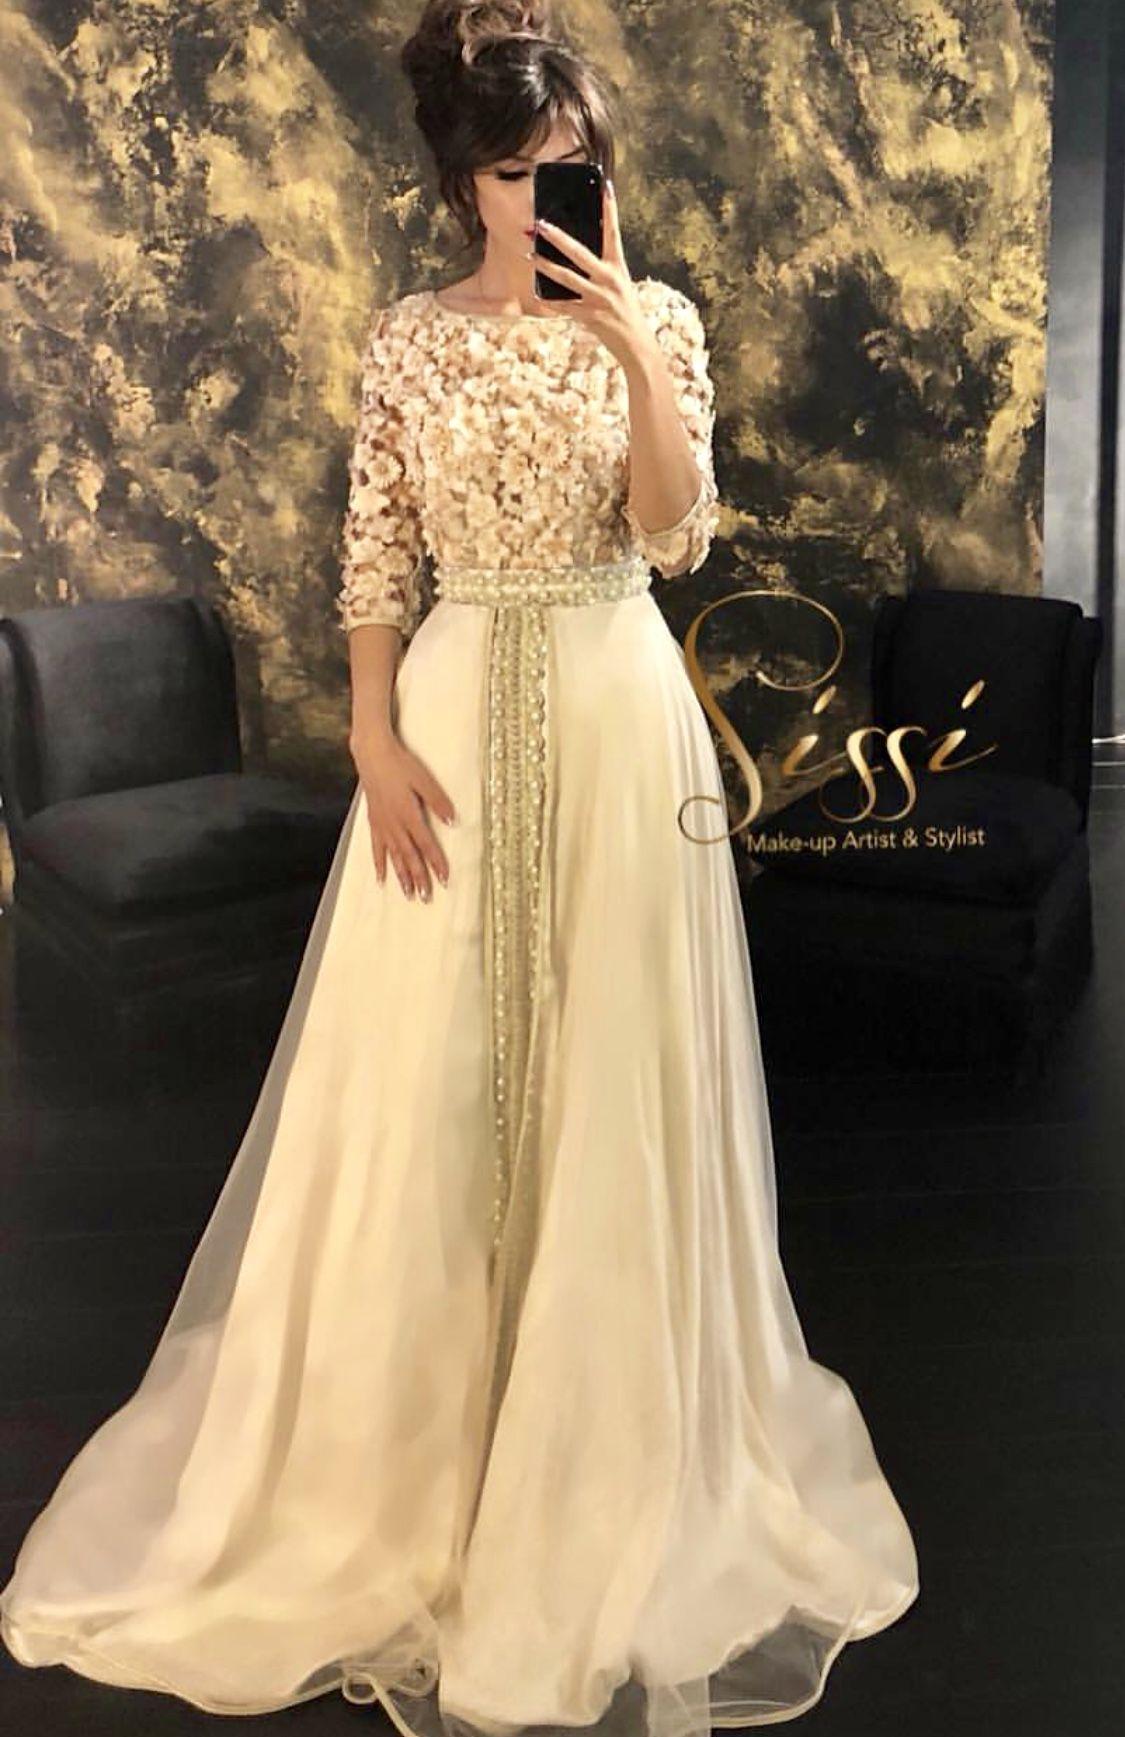 Robe cafton  Morrocan dress, Wedding dress couture, Moroccan dress